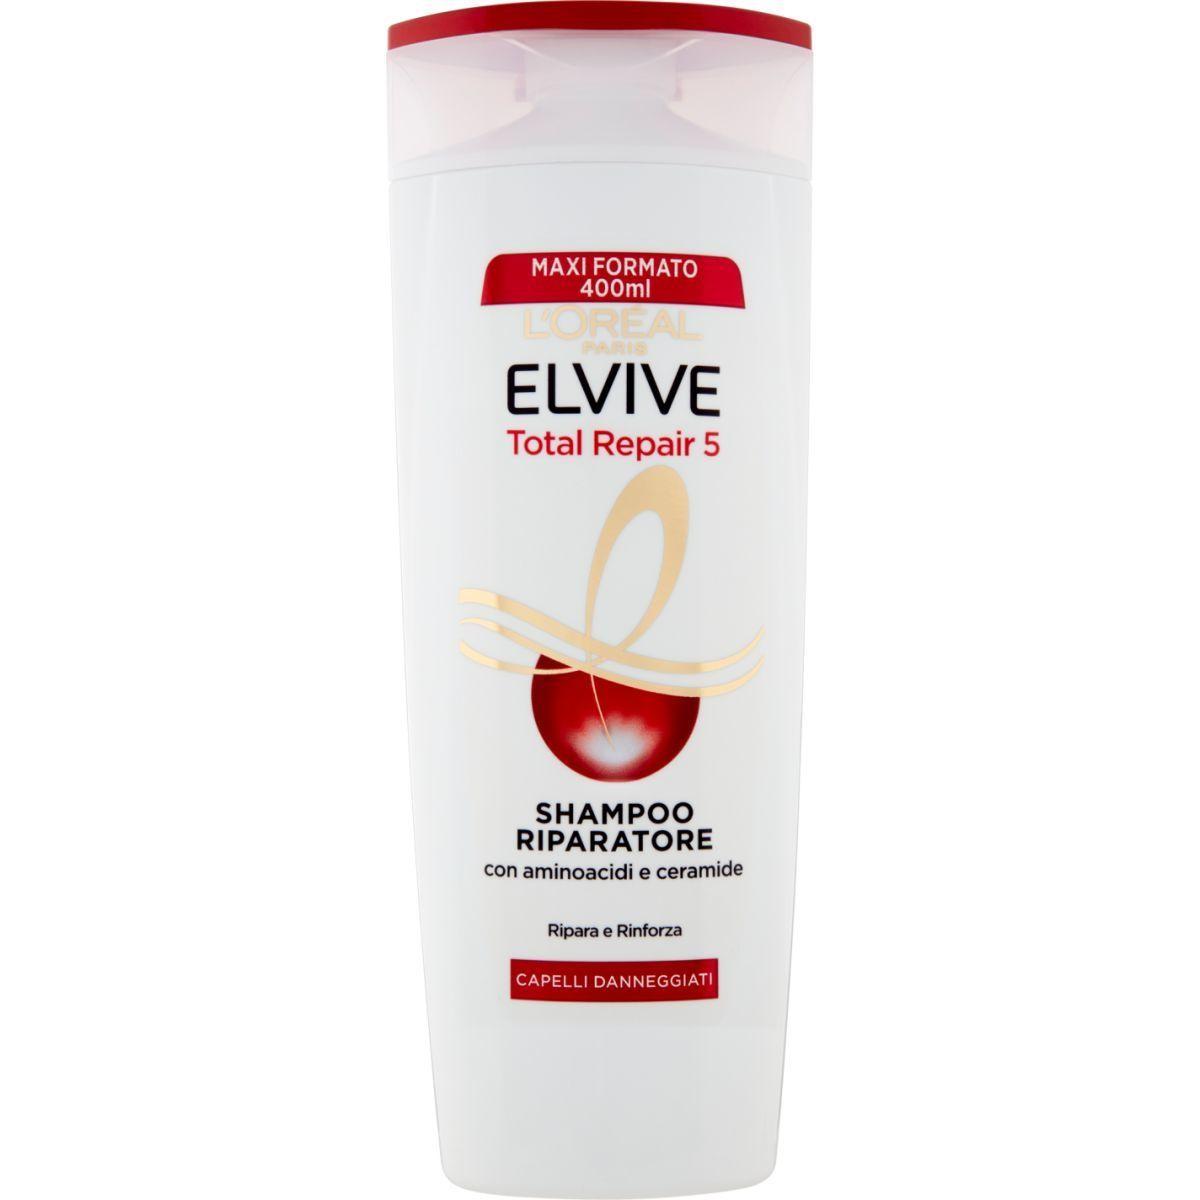 ELVIVE Shampoo Total Repair 5 400 ml